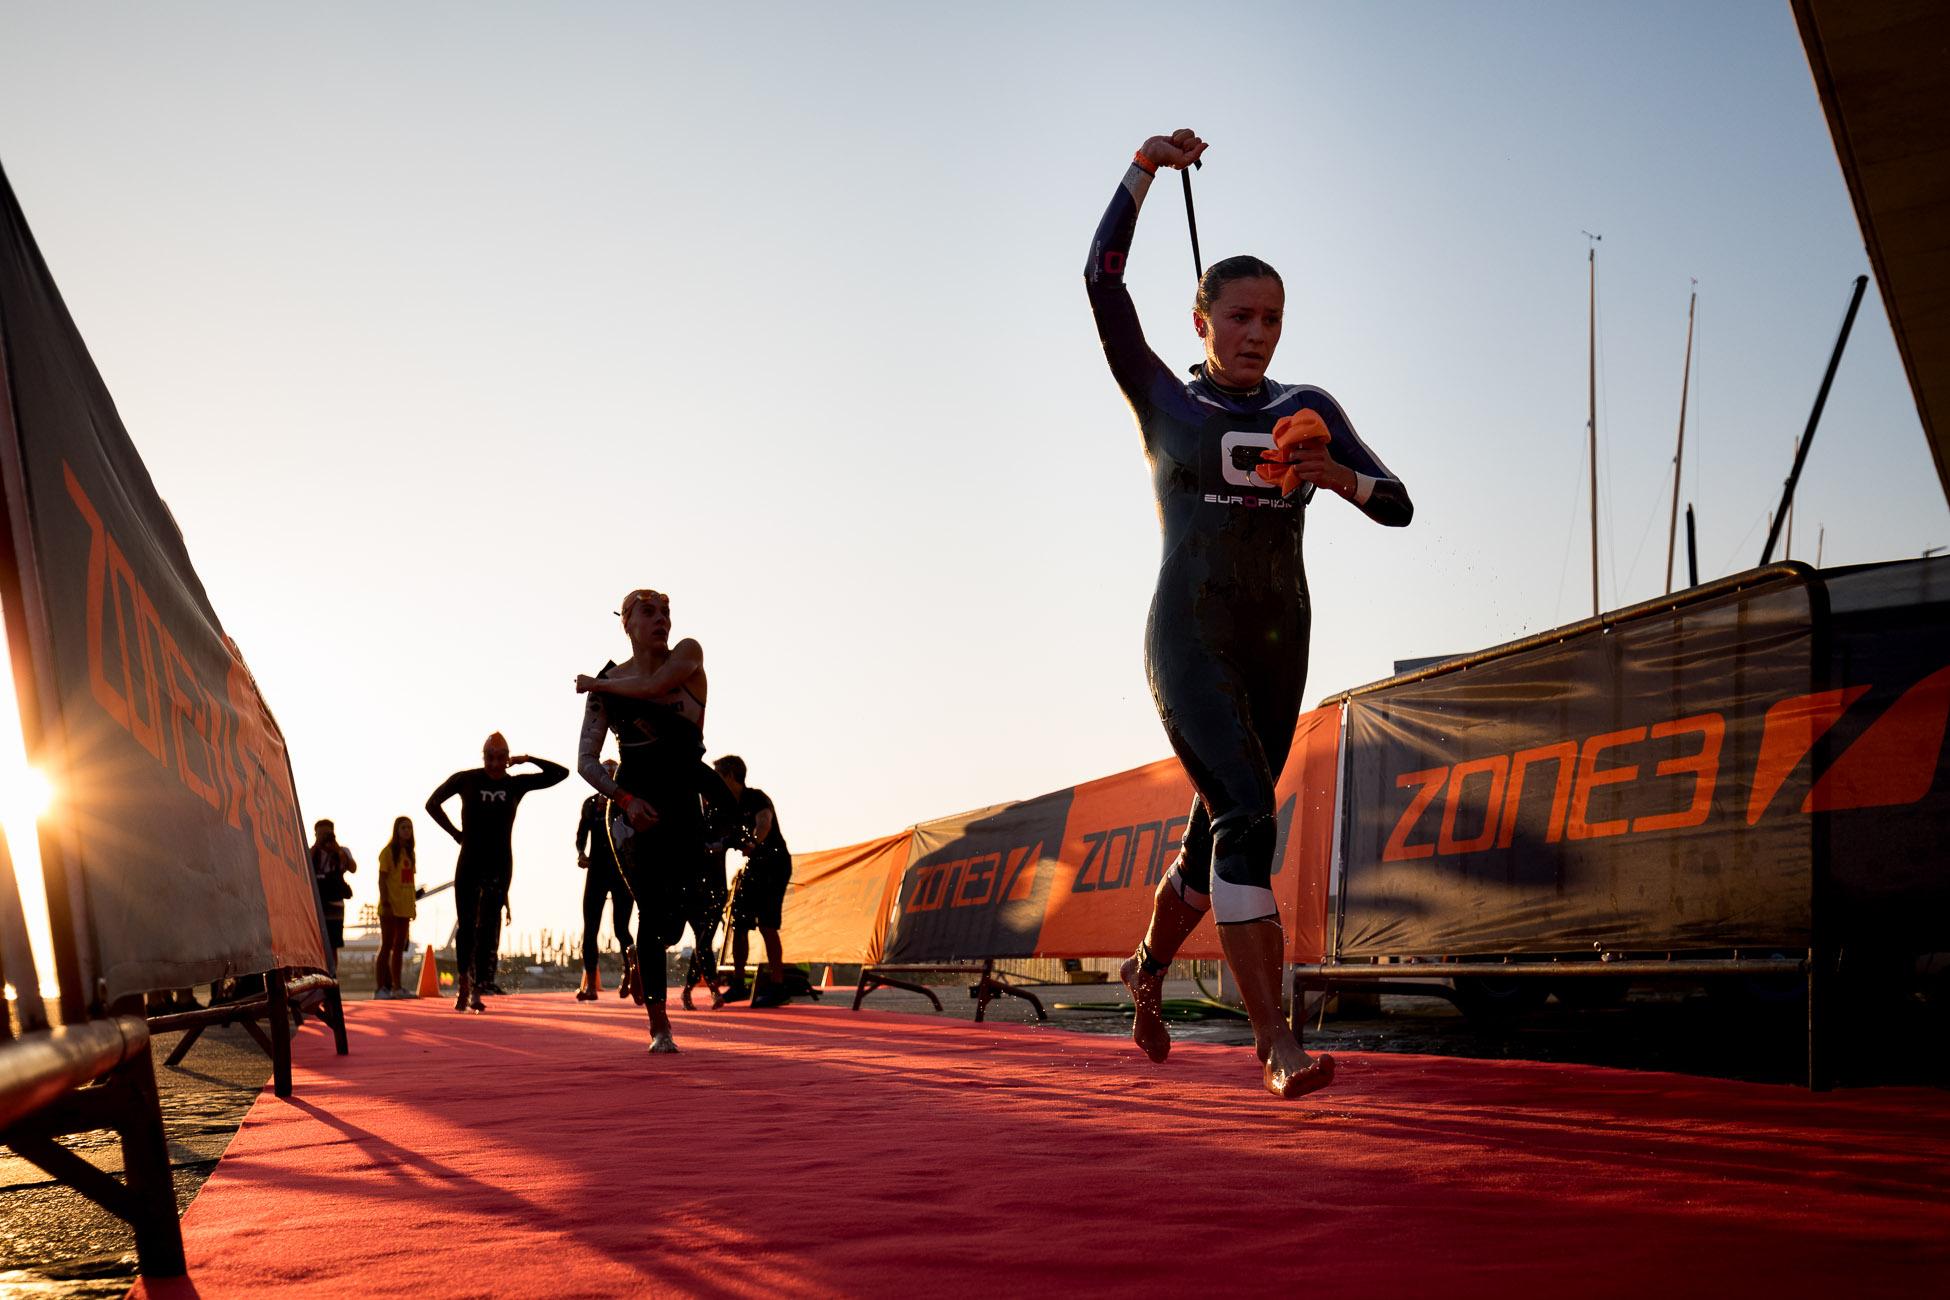 ironman-triathlon-fitness-lifestyle-sport-athlete-photography-009.jpg